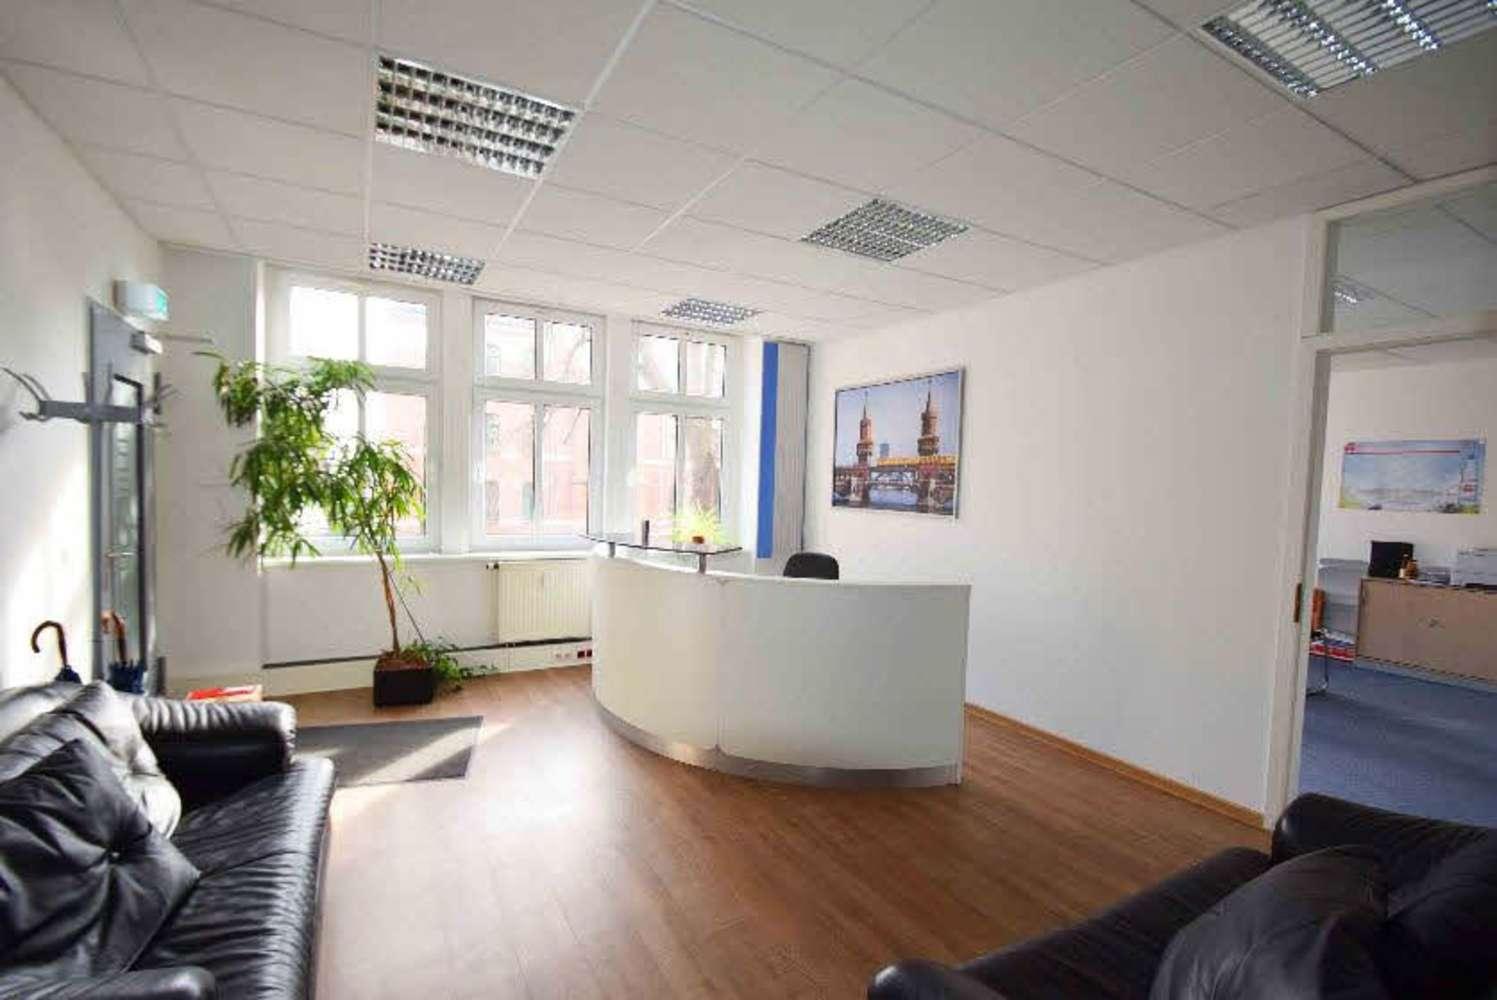 Büros Berlin, 12435 - Büro - Berlin, Alt-Treptow - B1824 - 10702853